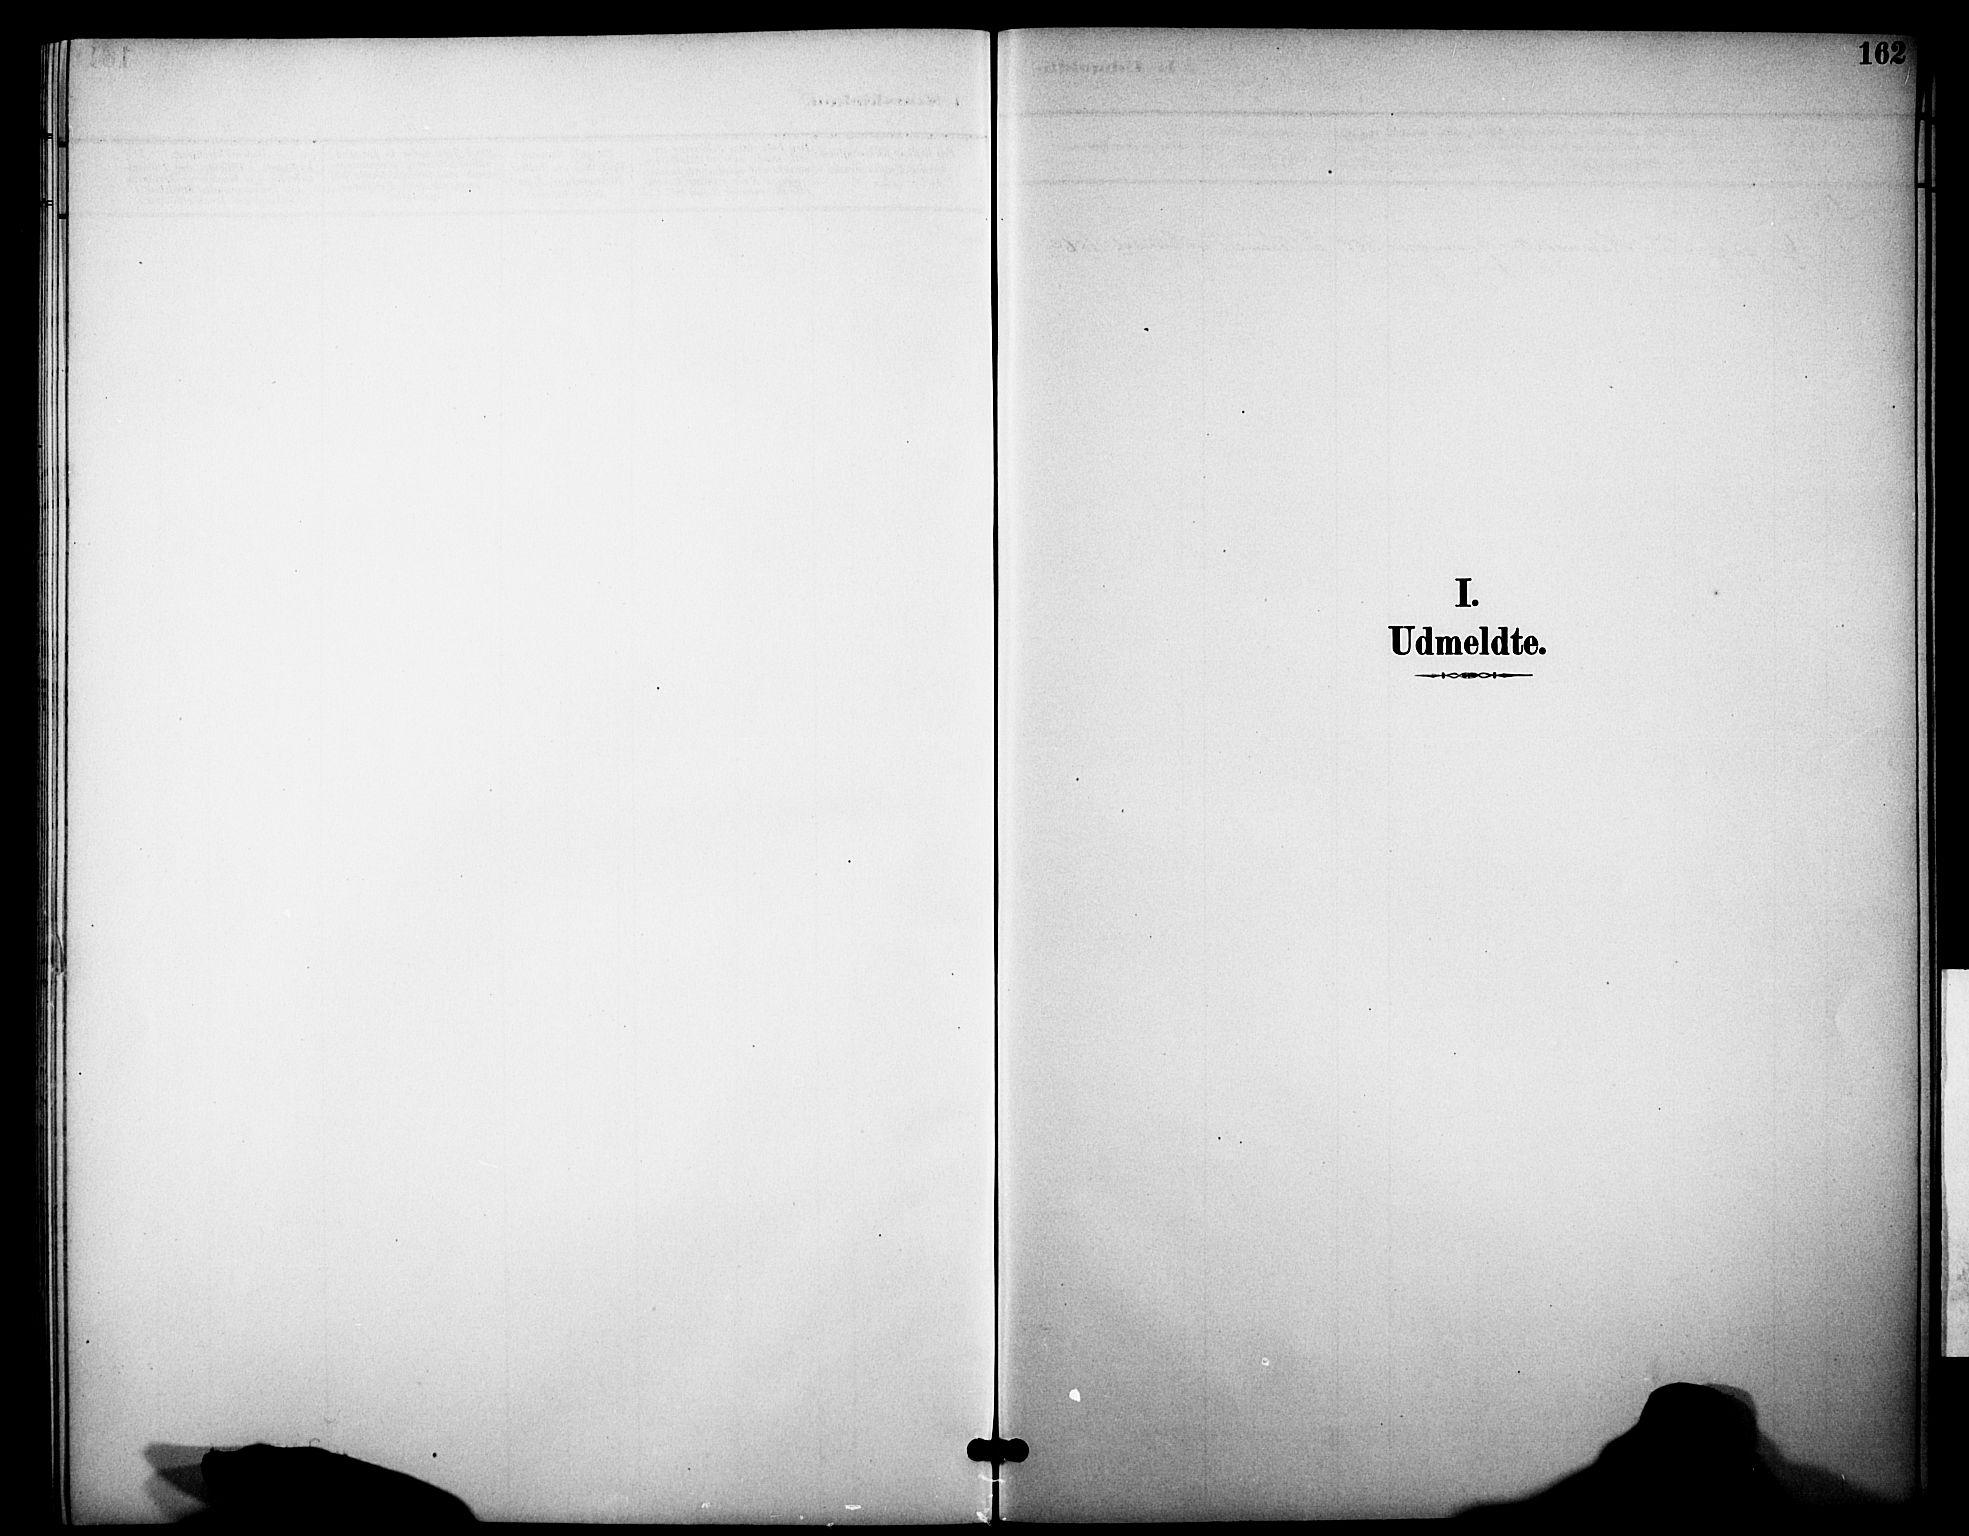 SAKO, Heddal kirkebøker, F/Fb/L0001: Ministerialbok nr. II 1, 1884-1910, s. 162